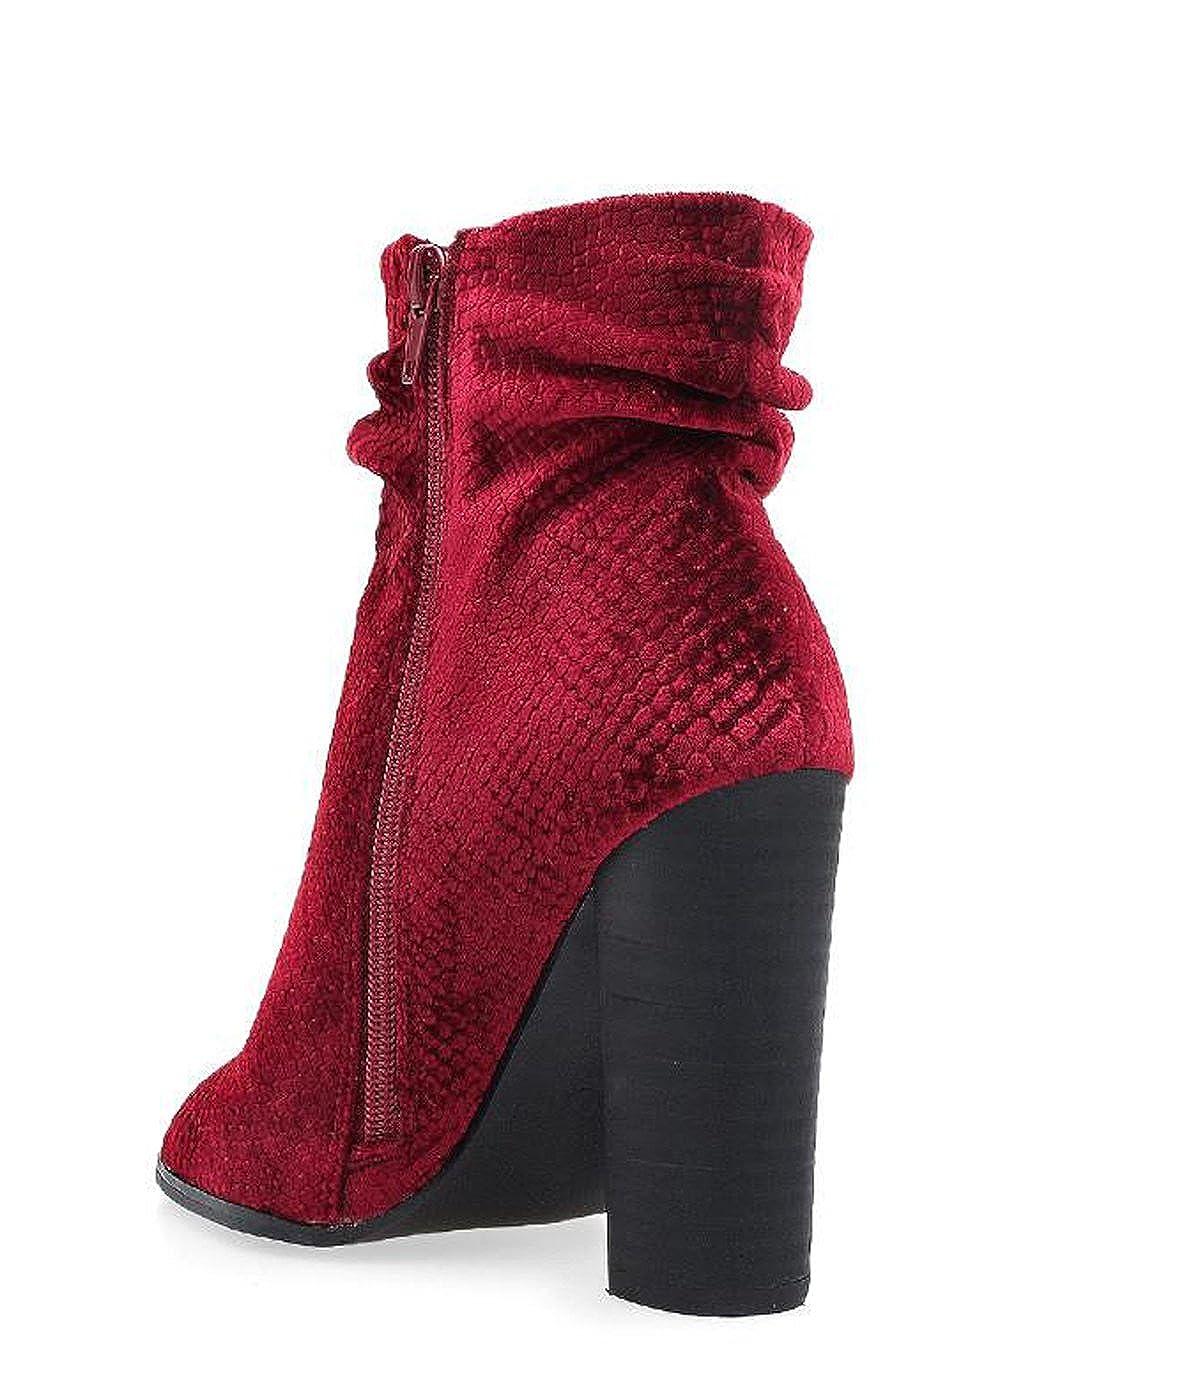 d2e65b05a5cb Privileged by J.C. DOSSIER Misha Wine Velvet Open Toe Block Heel Ankle  Booties